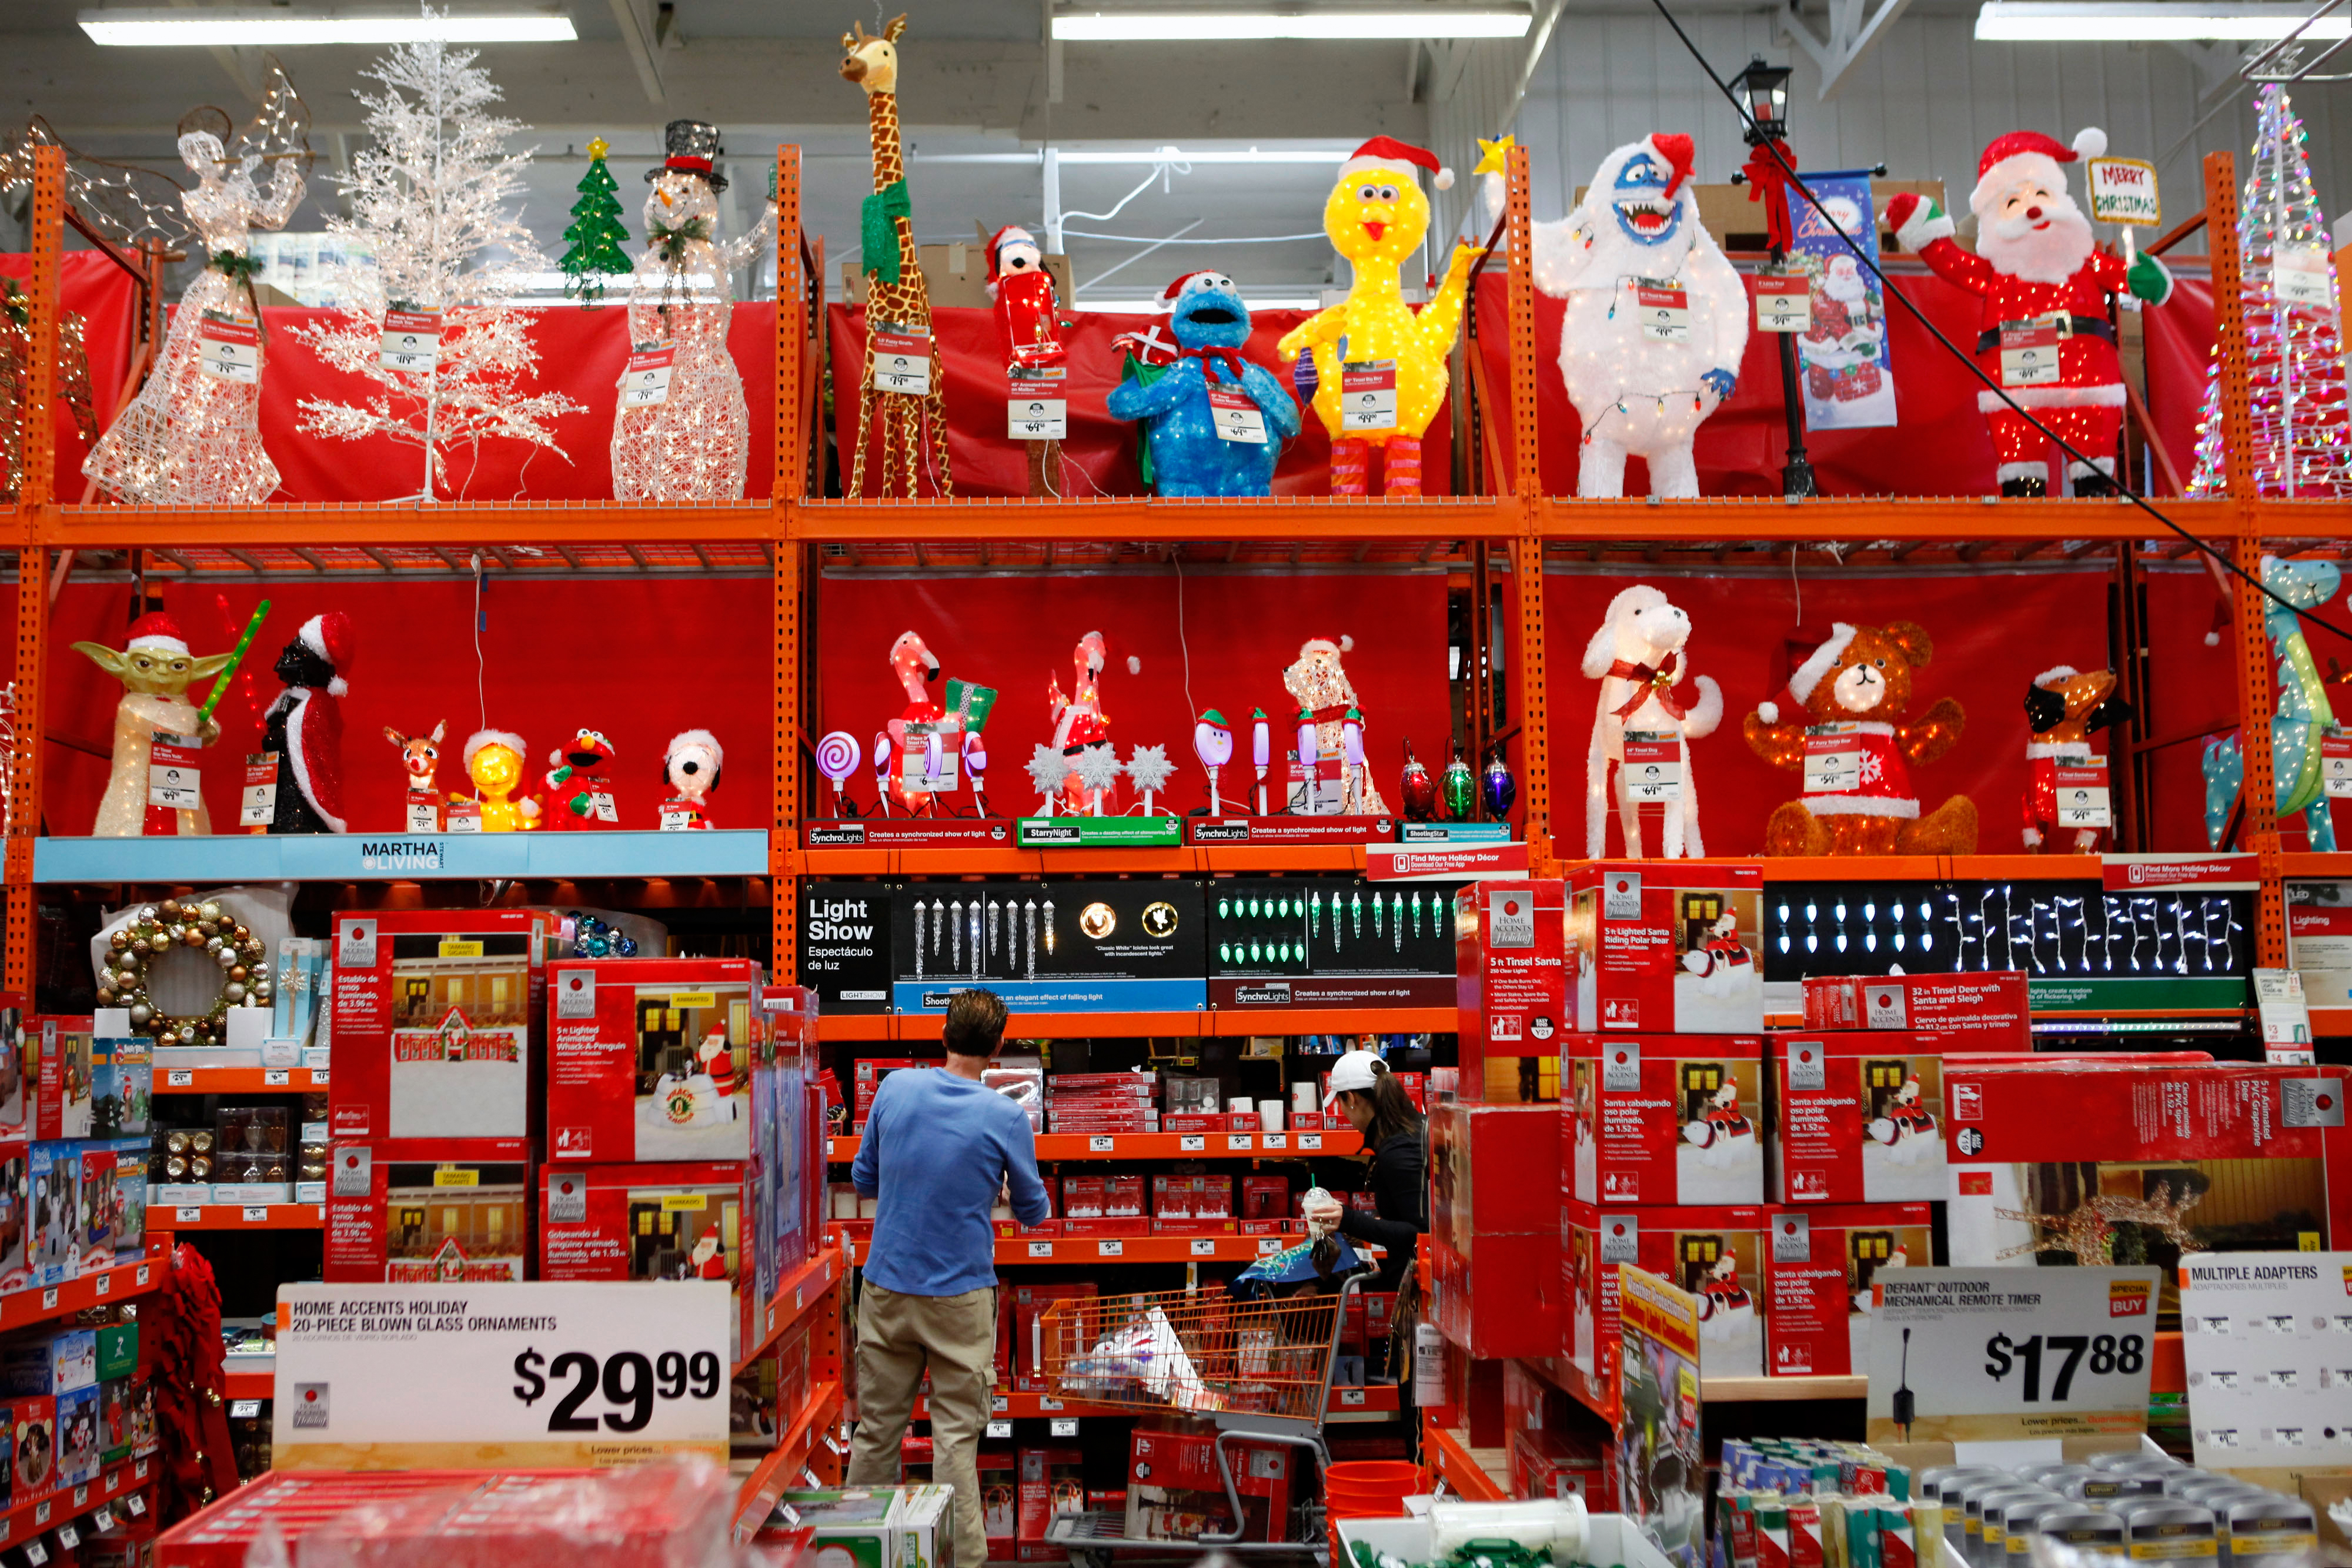 Post Christmas Decorations Deals At Home Depot Walmart Target Sears Money